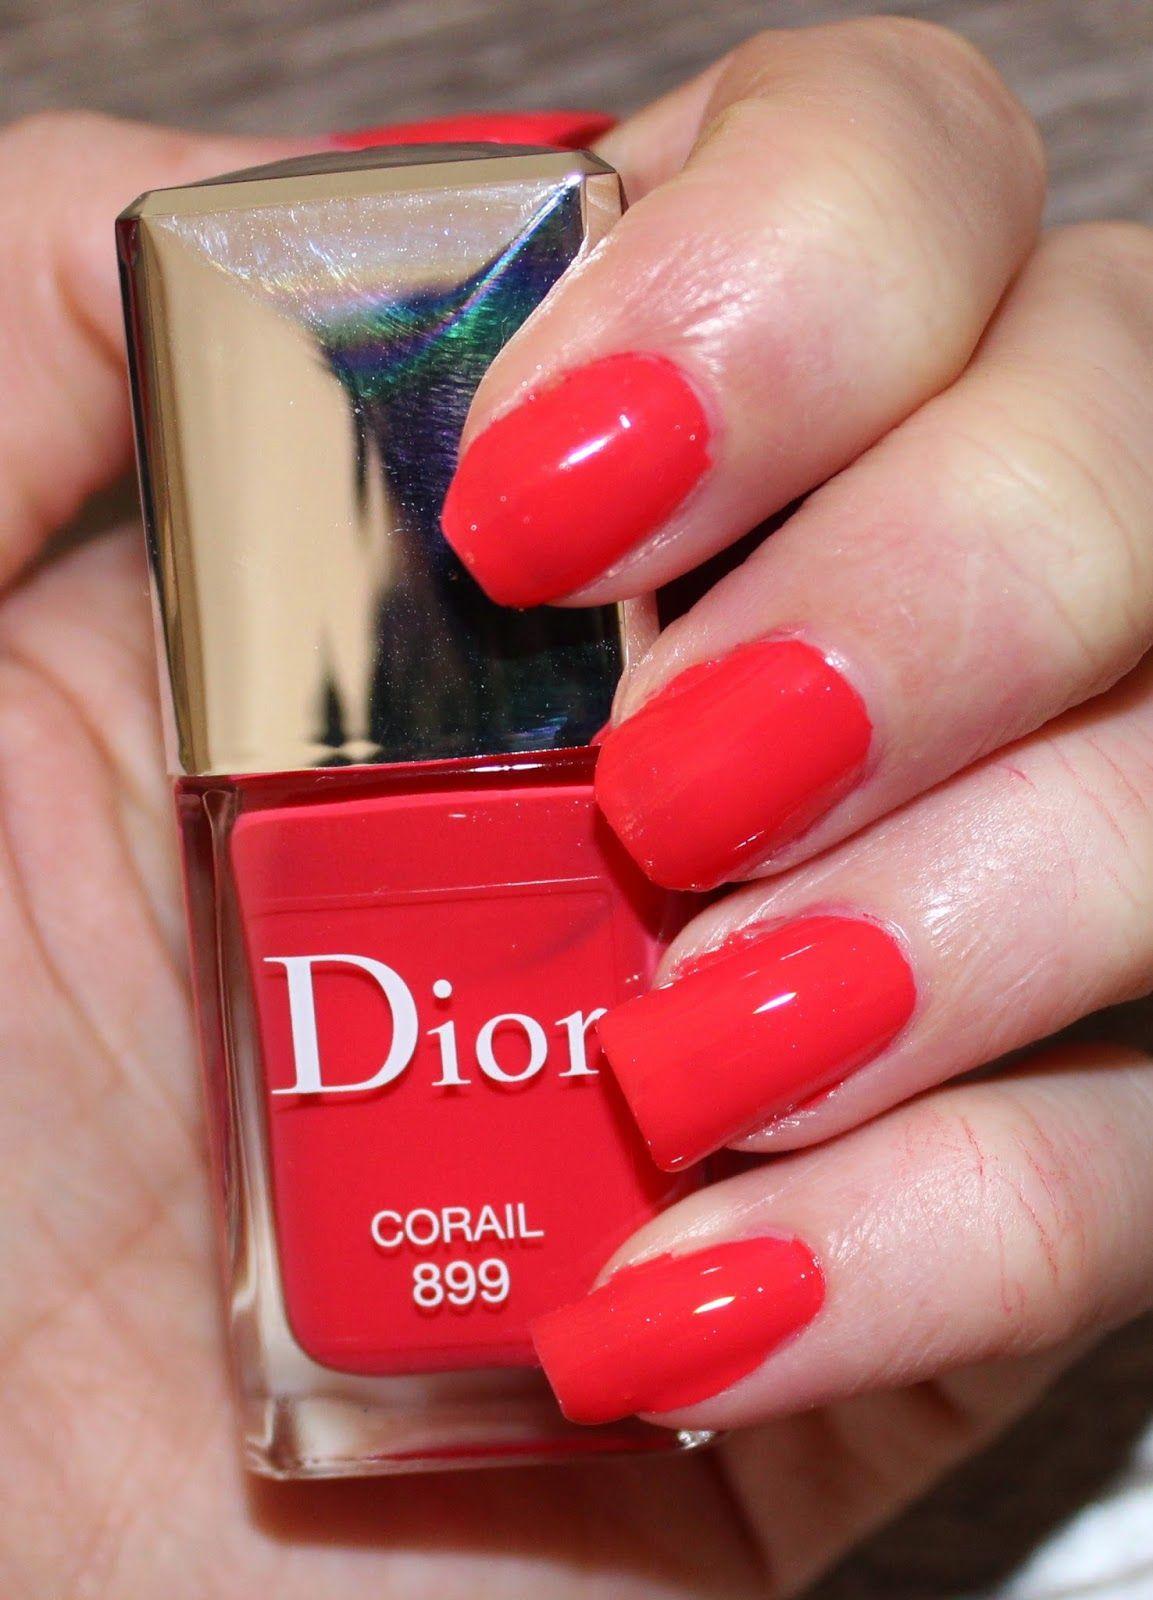 Dior Vernis in Corail   Nail Polish   Pinterest